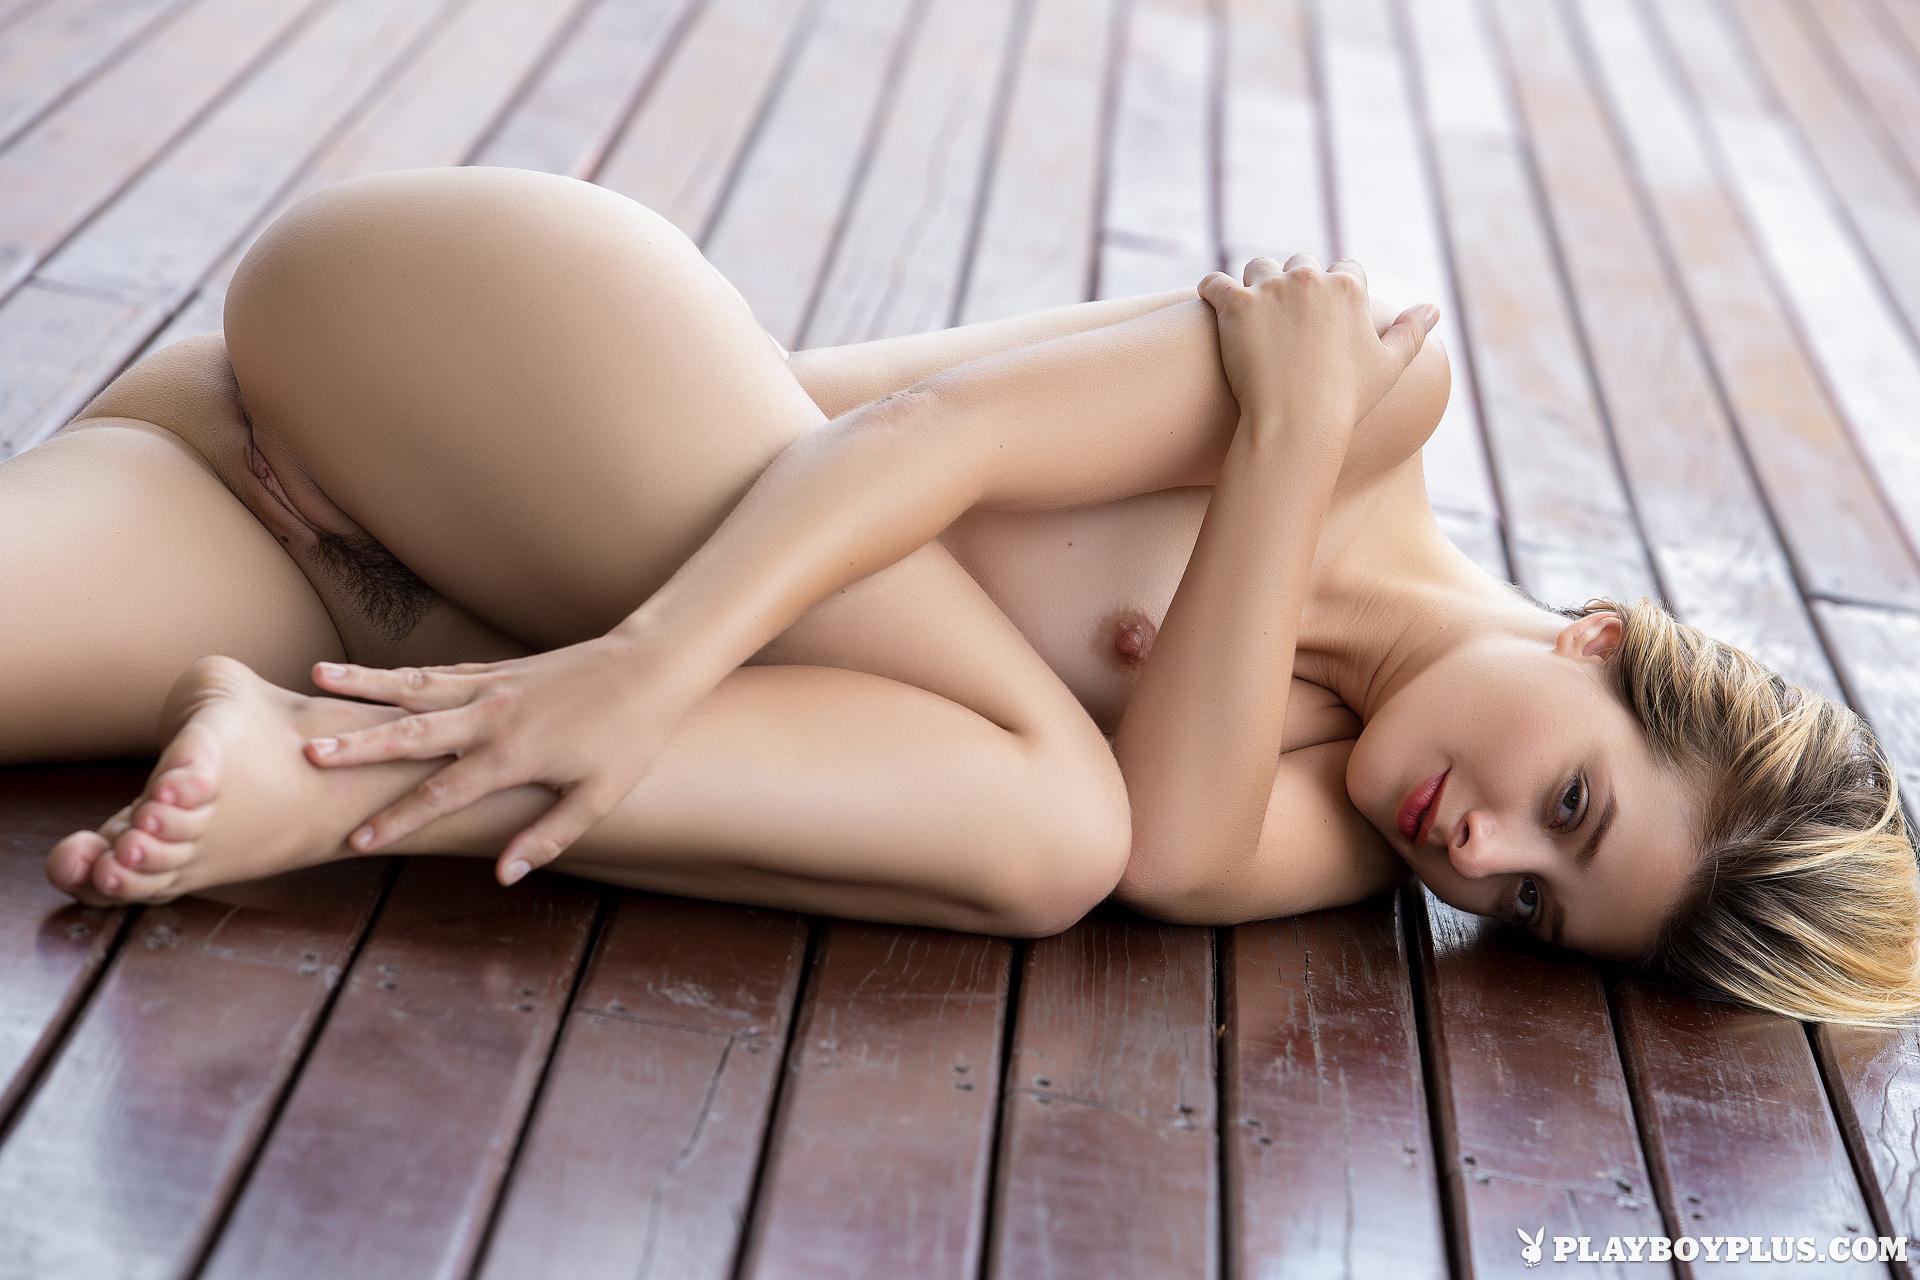 image Sara jean underwood perfect naked body